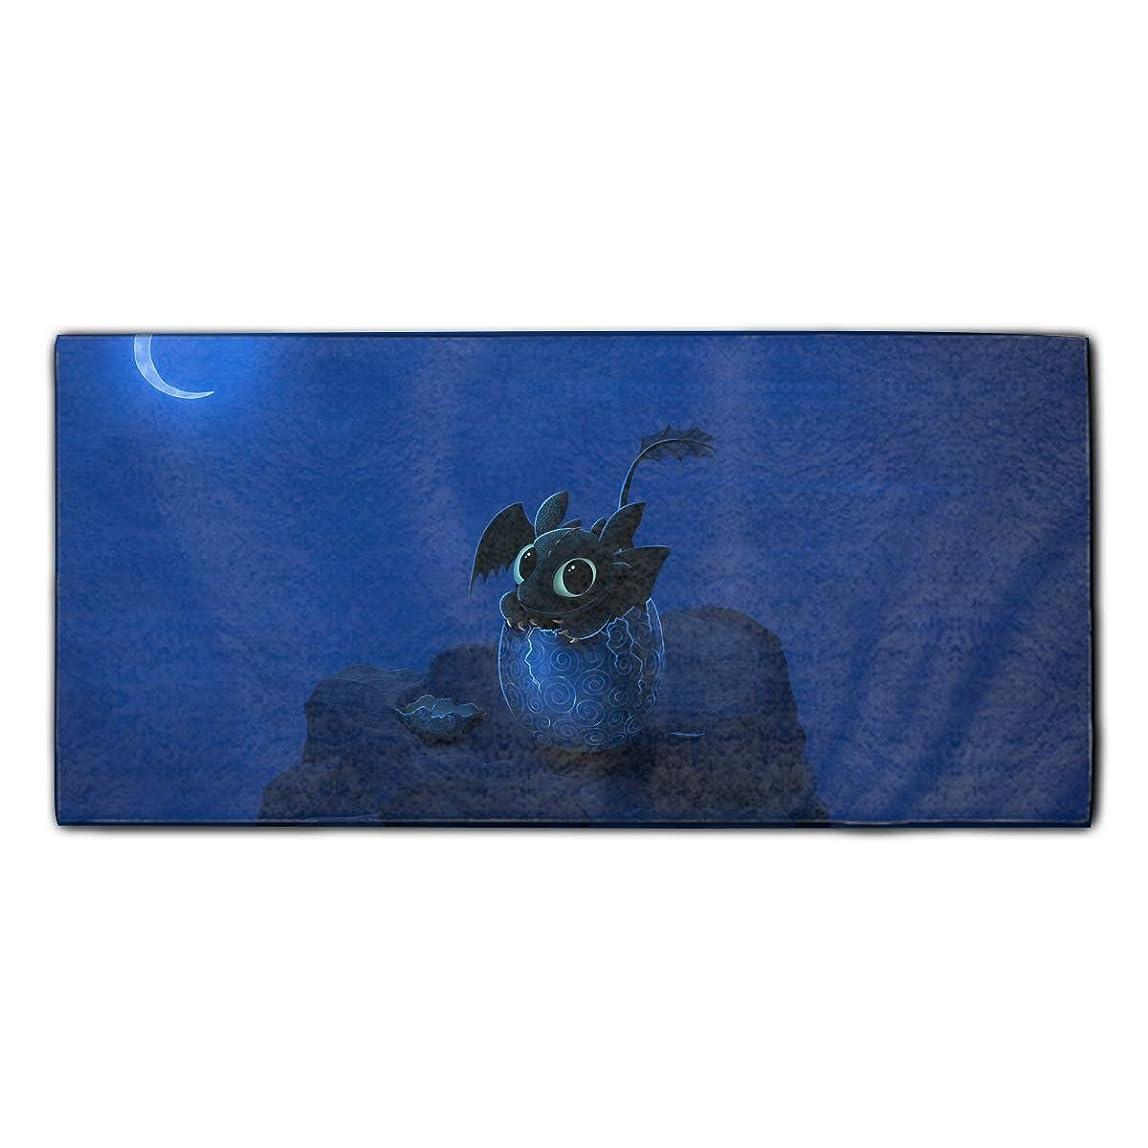 Artistic Little Dragon Face Towel 11.8 × 27.5 Inches - Bath, Hand & Washcloth Towels Gift jsidakt493057